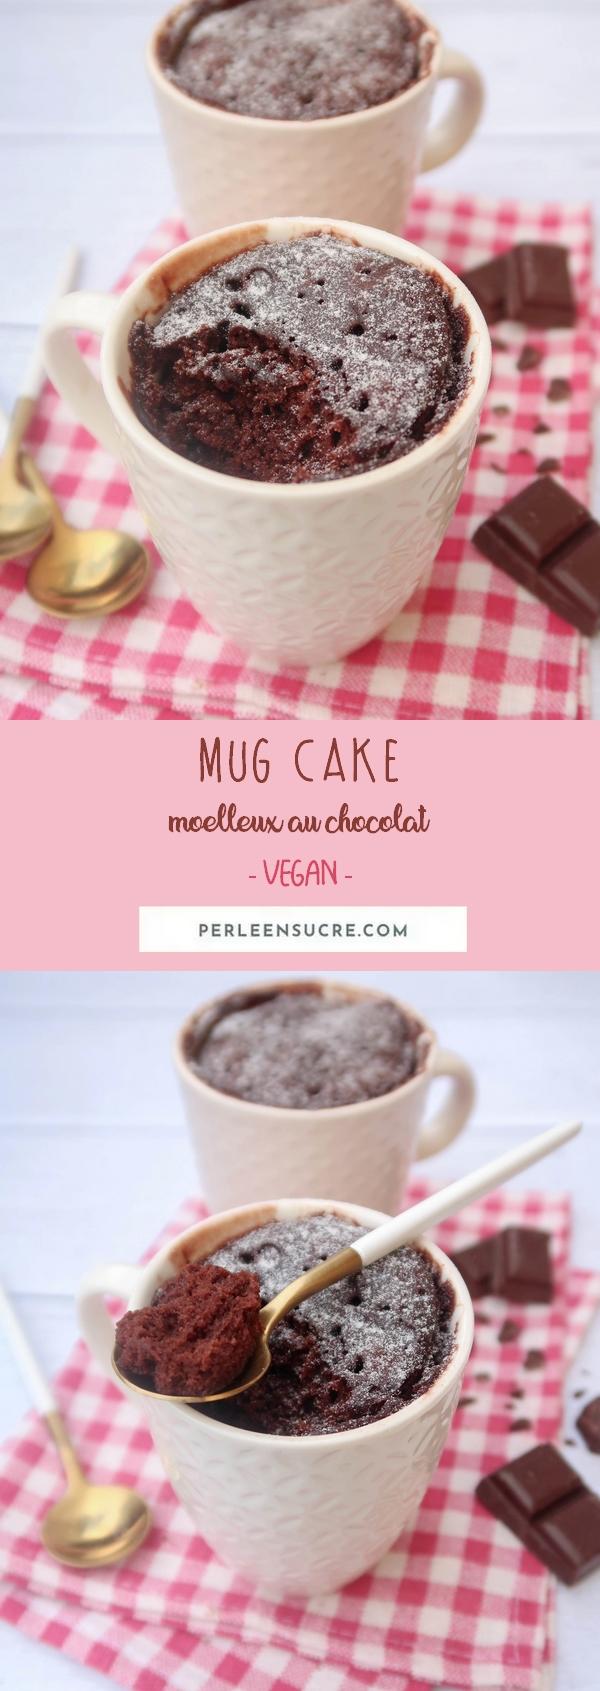 mug cake chocolat pînterest